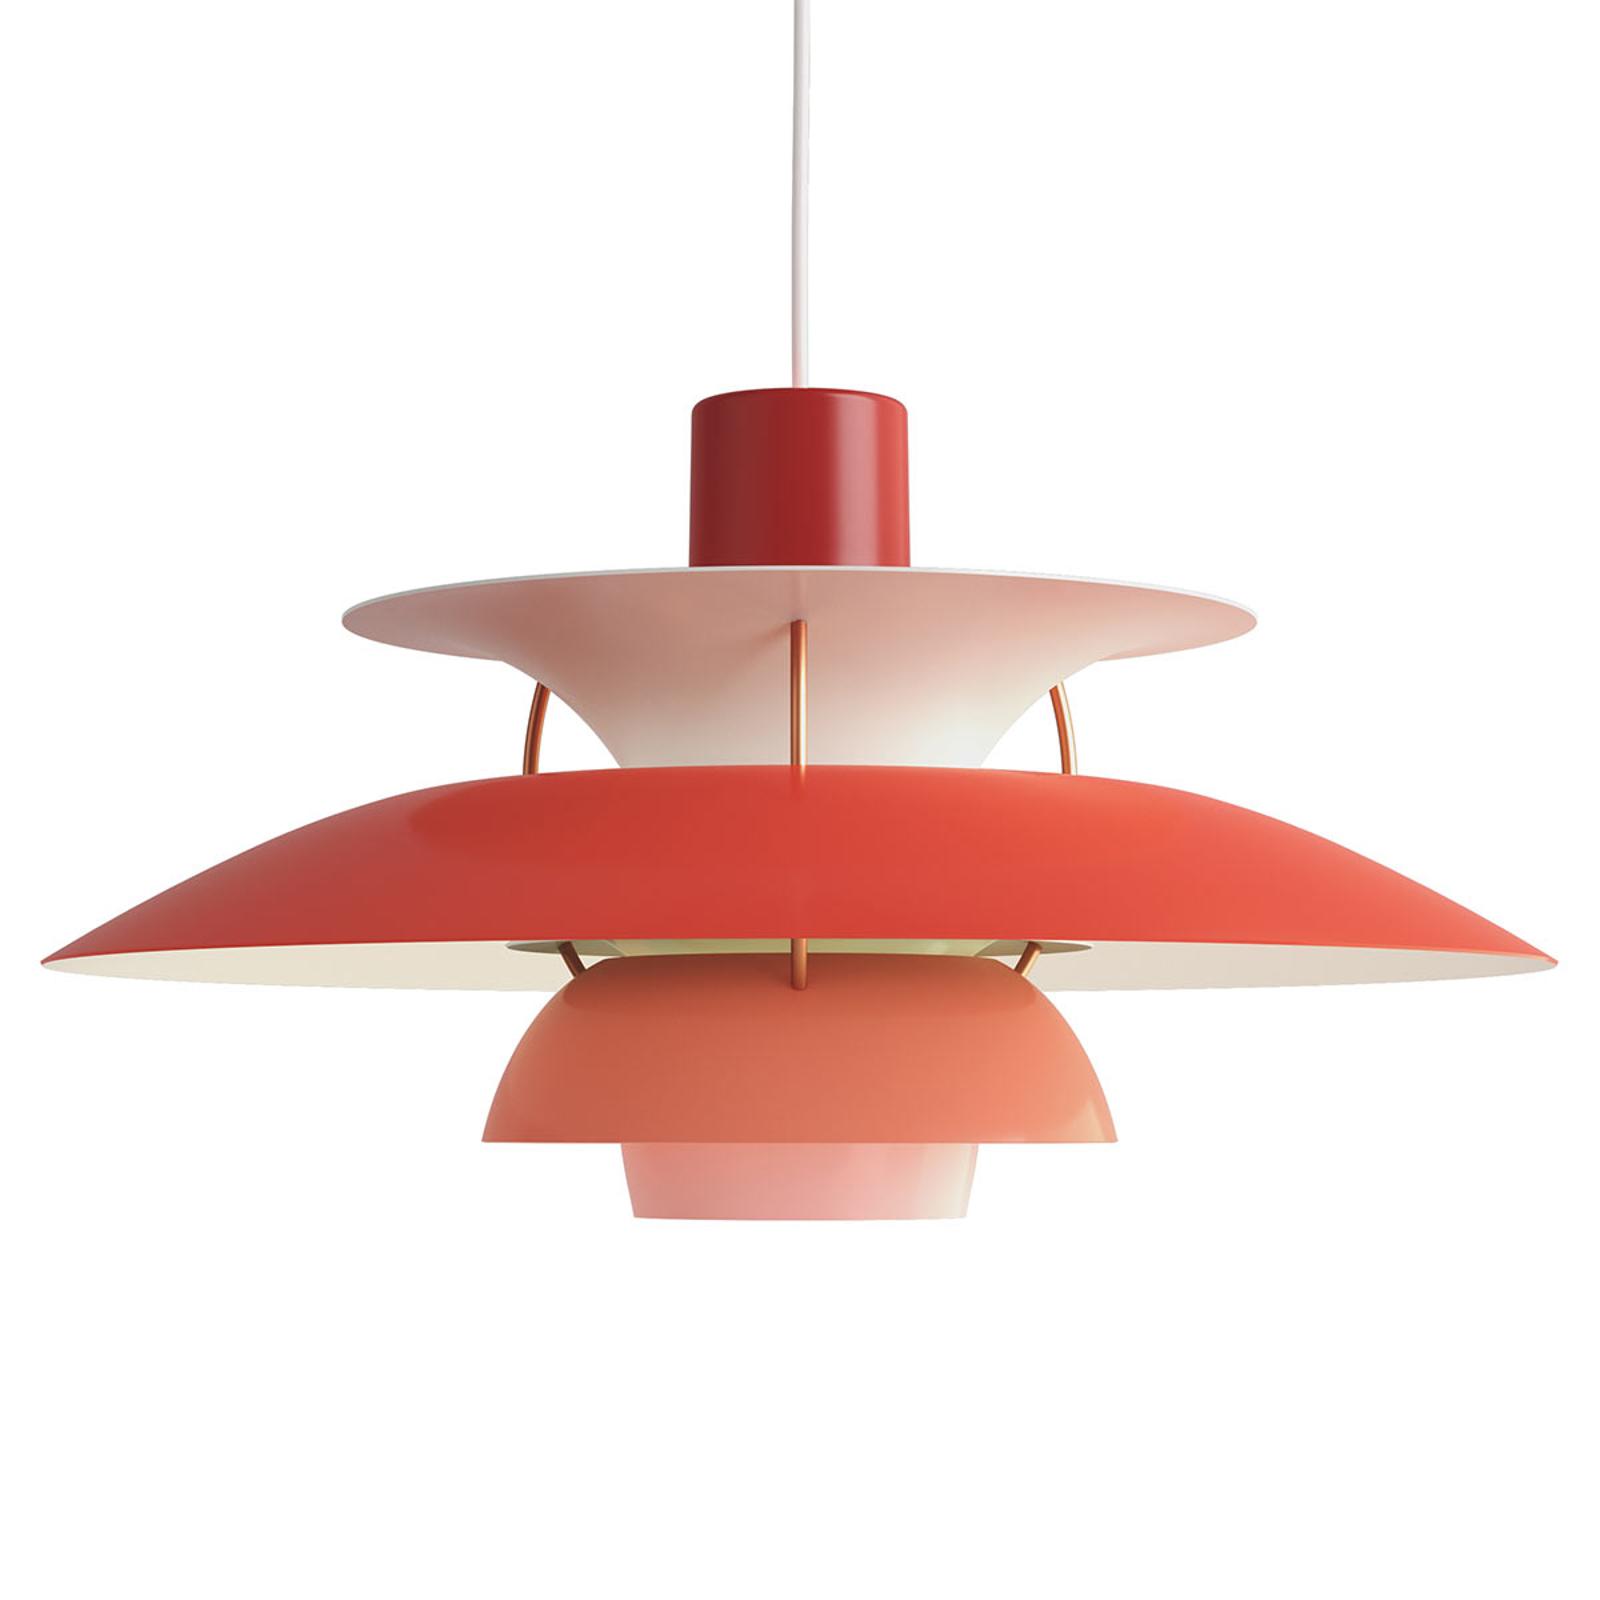 Deense designer hanglamp PH 5, rood